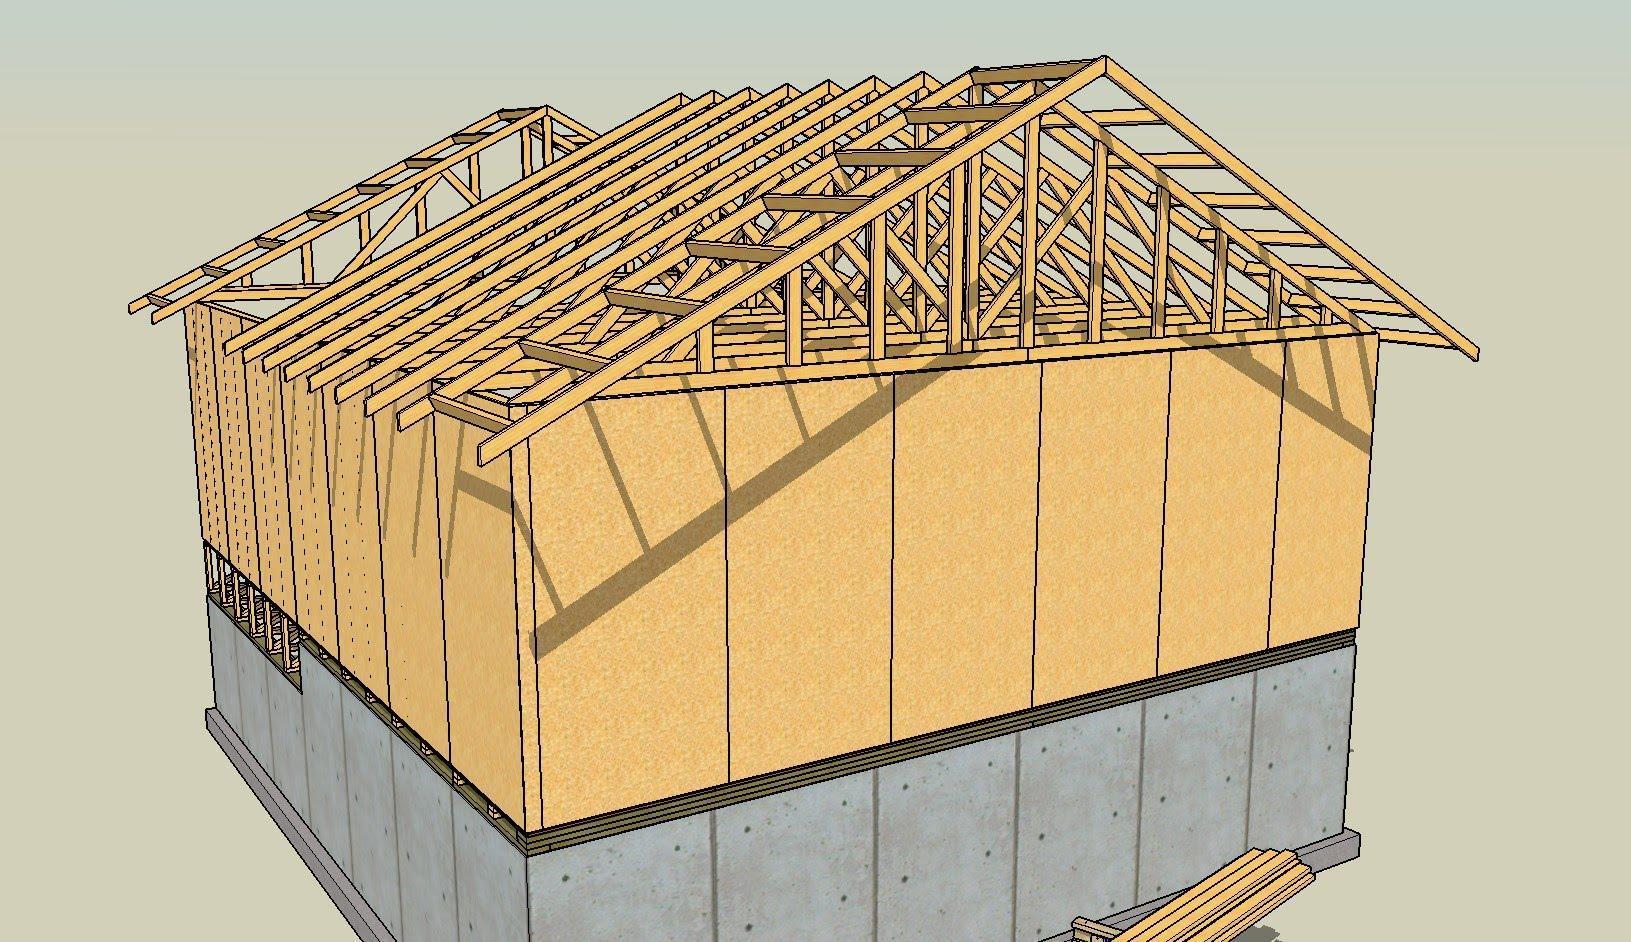 Best Roof Sketchup Design For Android Apk Download